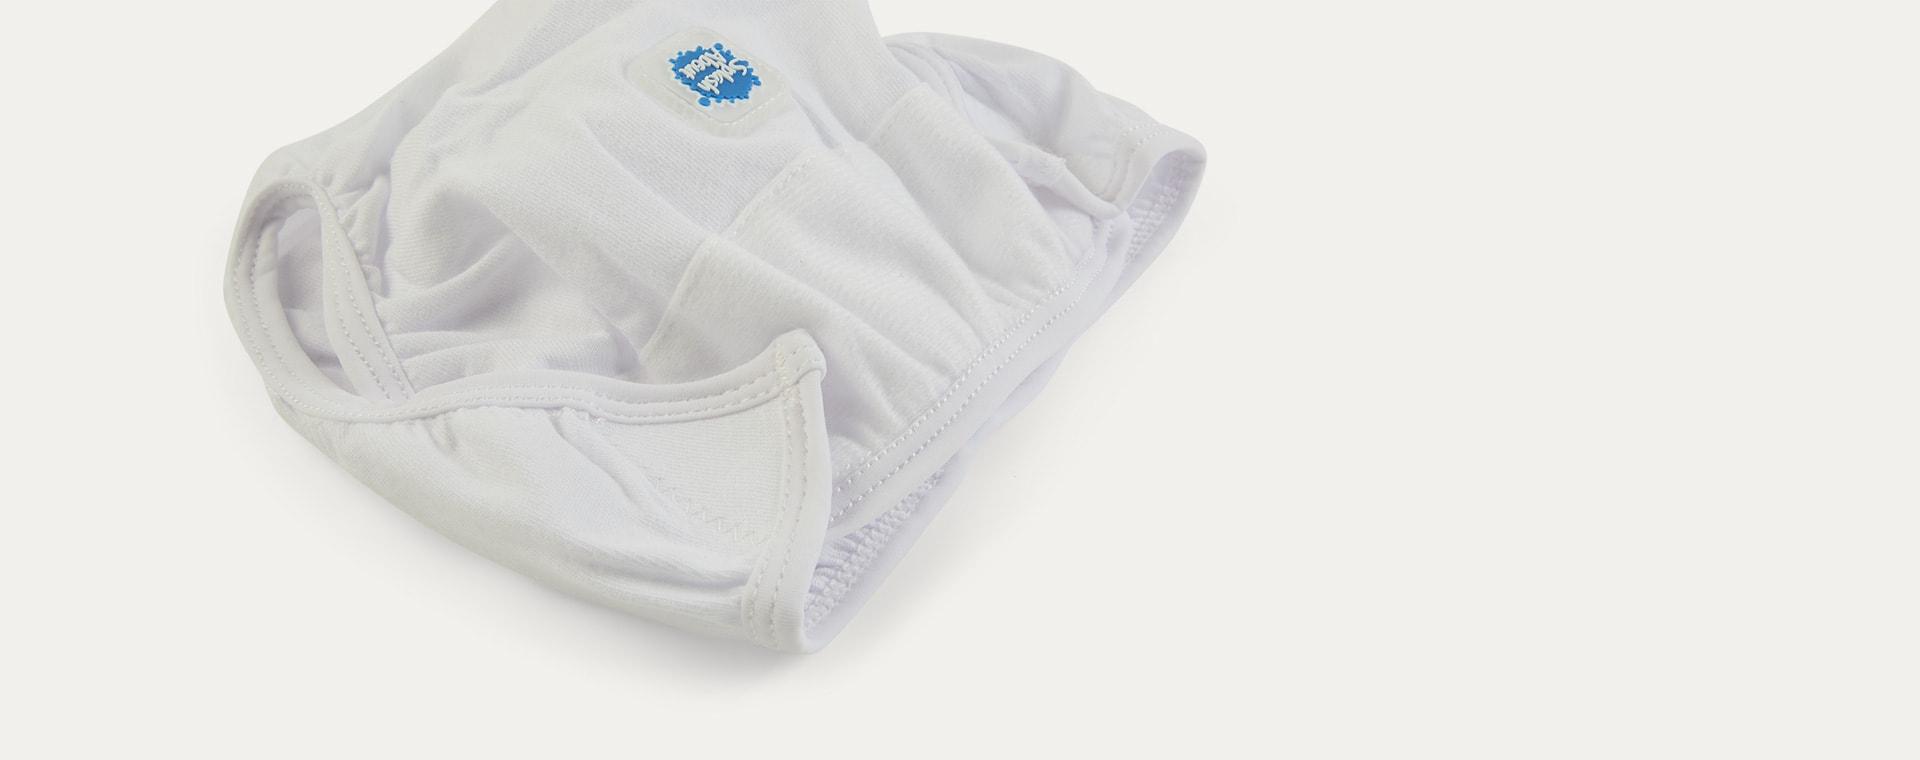 White Splash About Nappy Wrap